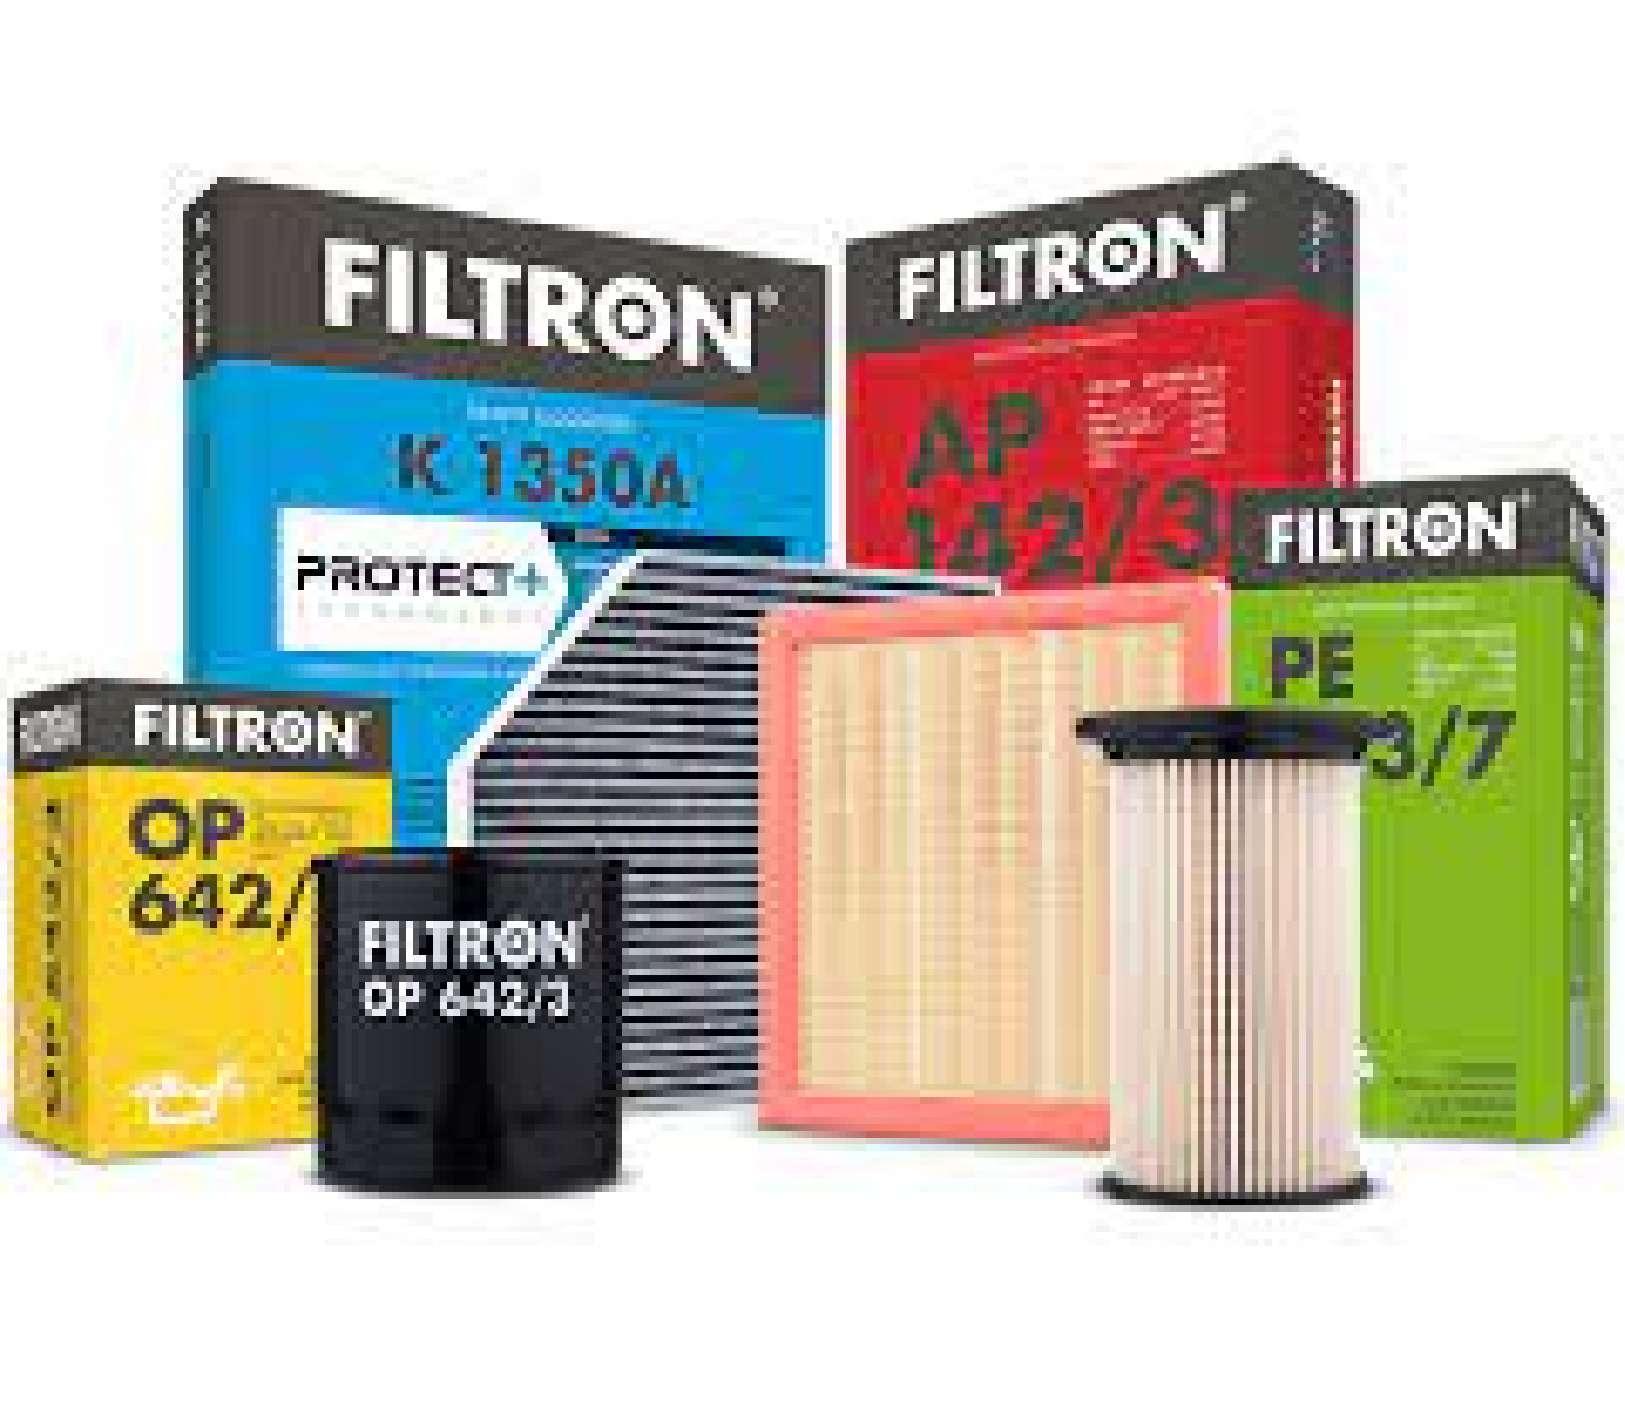 Filtron Filter Catalogue ss-01